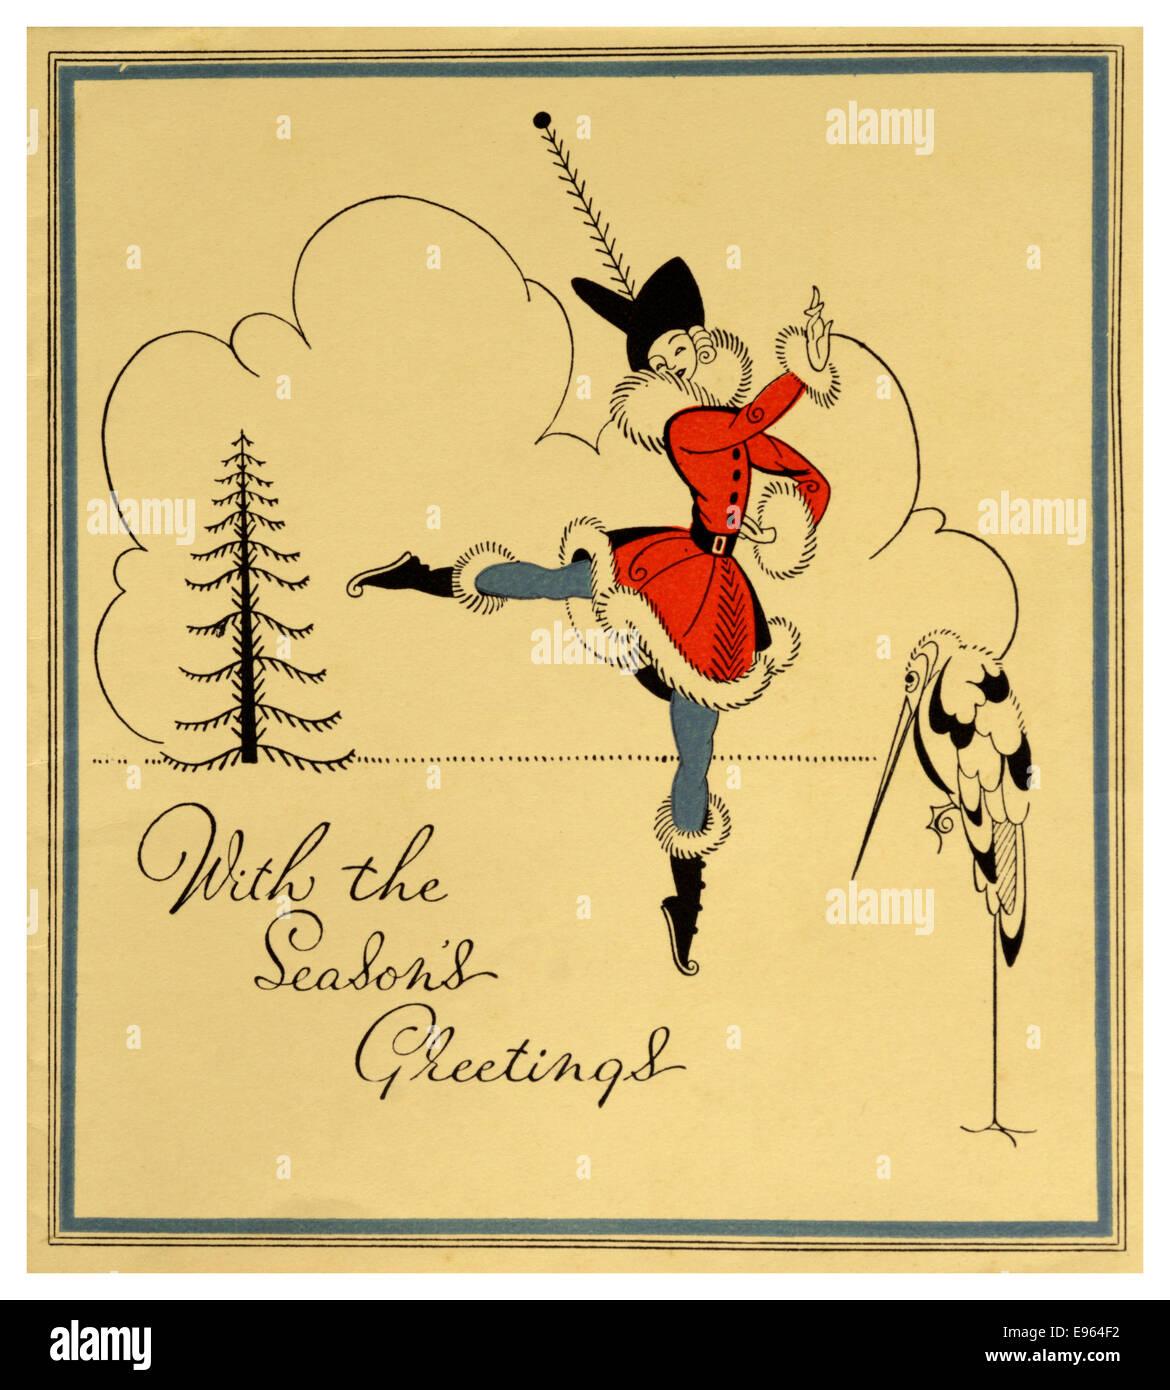 1930s Christmas Card Stock Photo Royalty Free Image